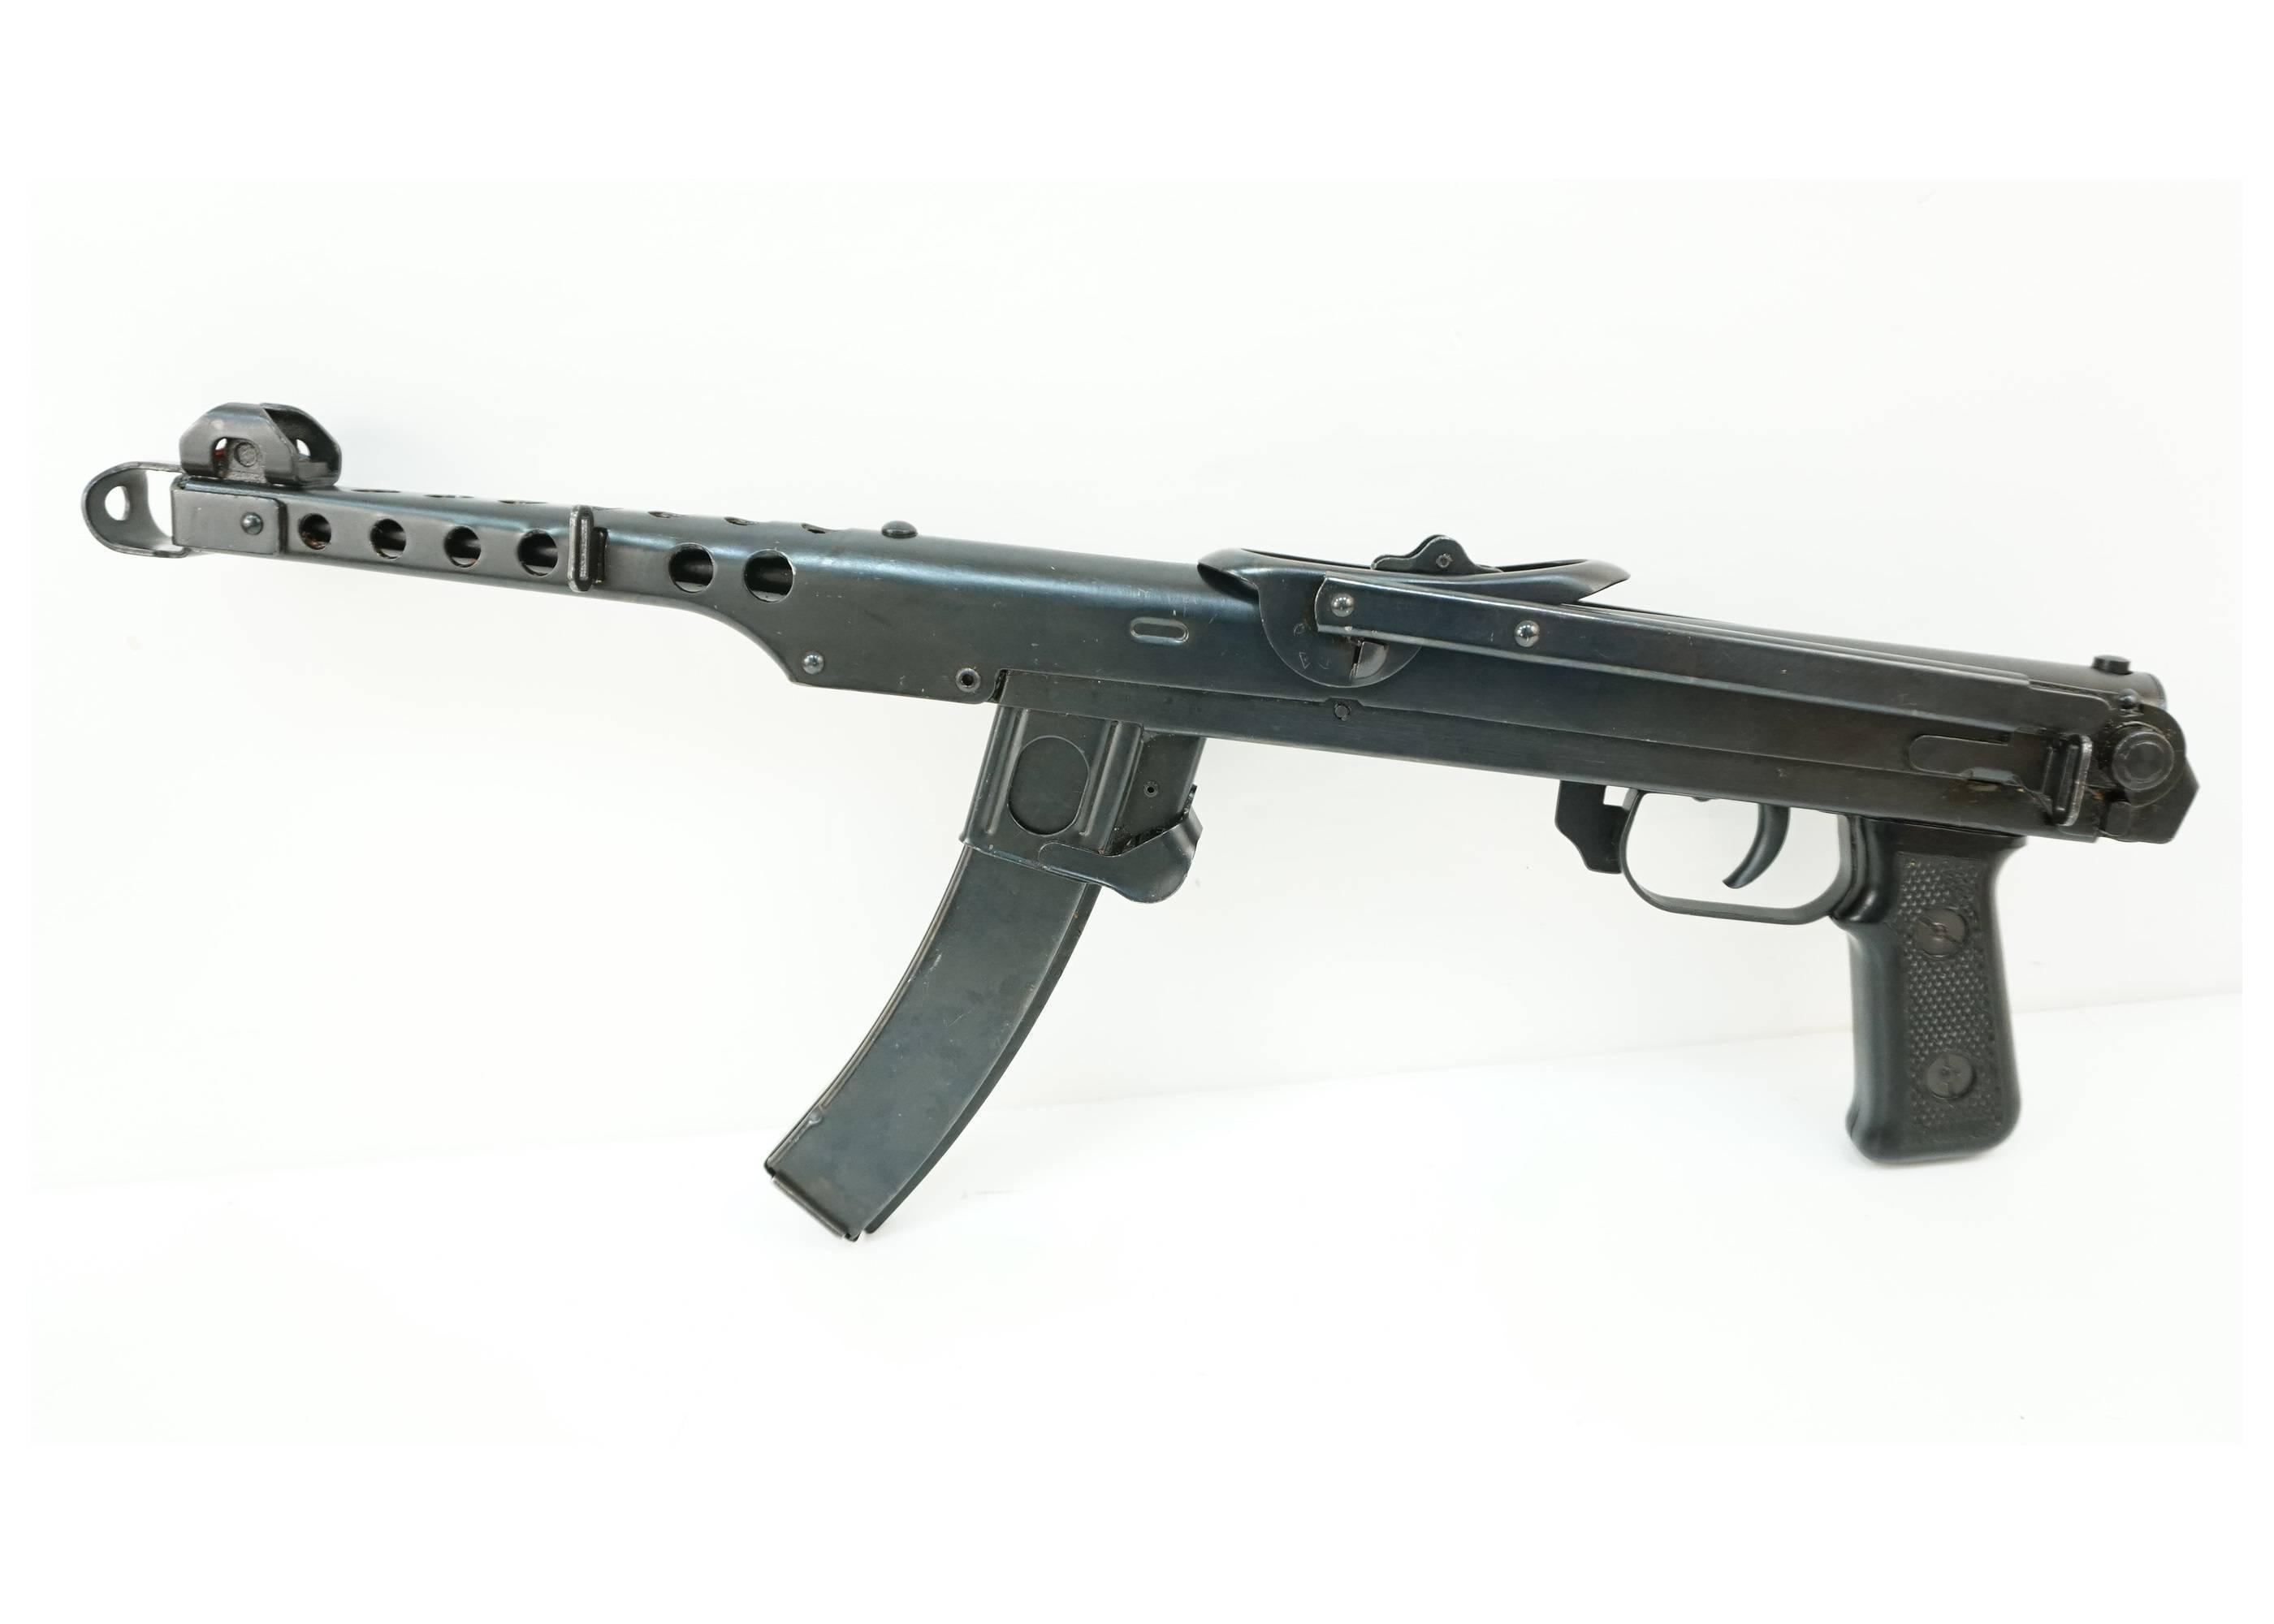 Пистолет-пулемёт судаева — википедия с видео // wiki 2